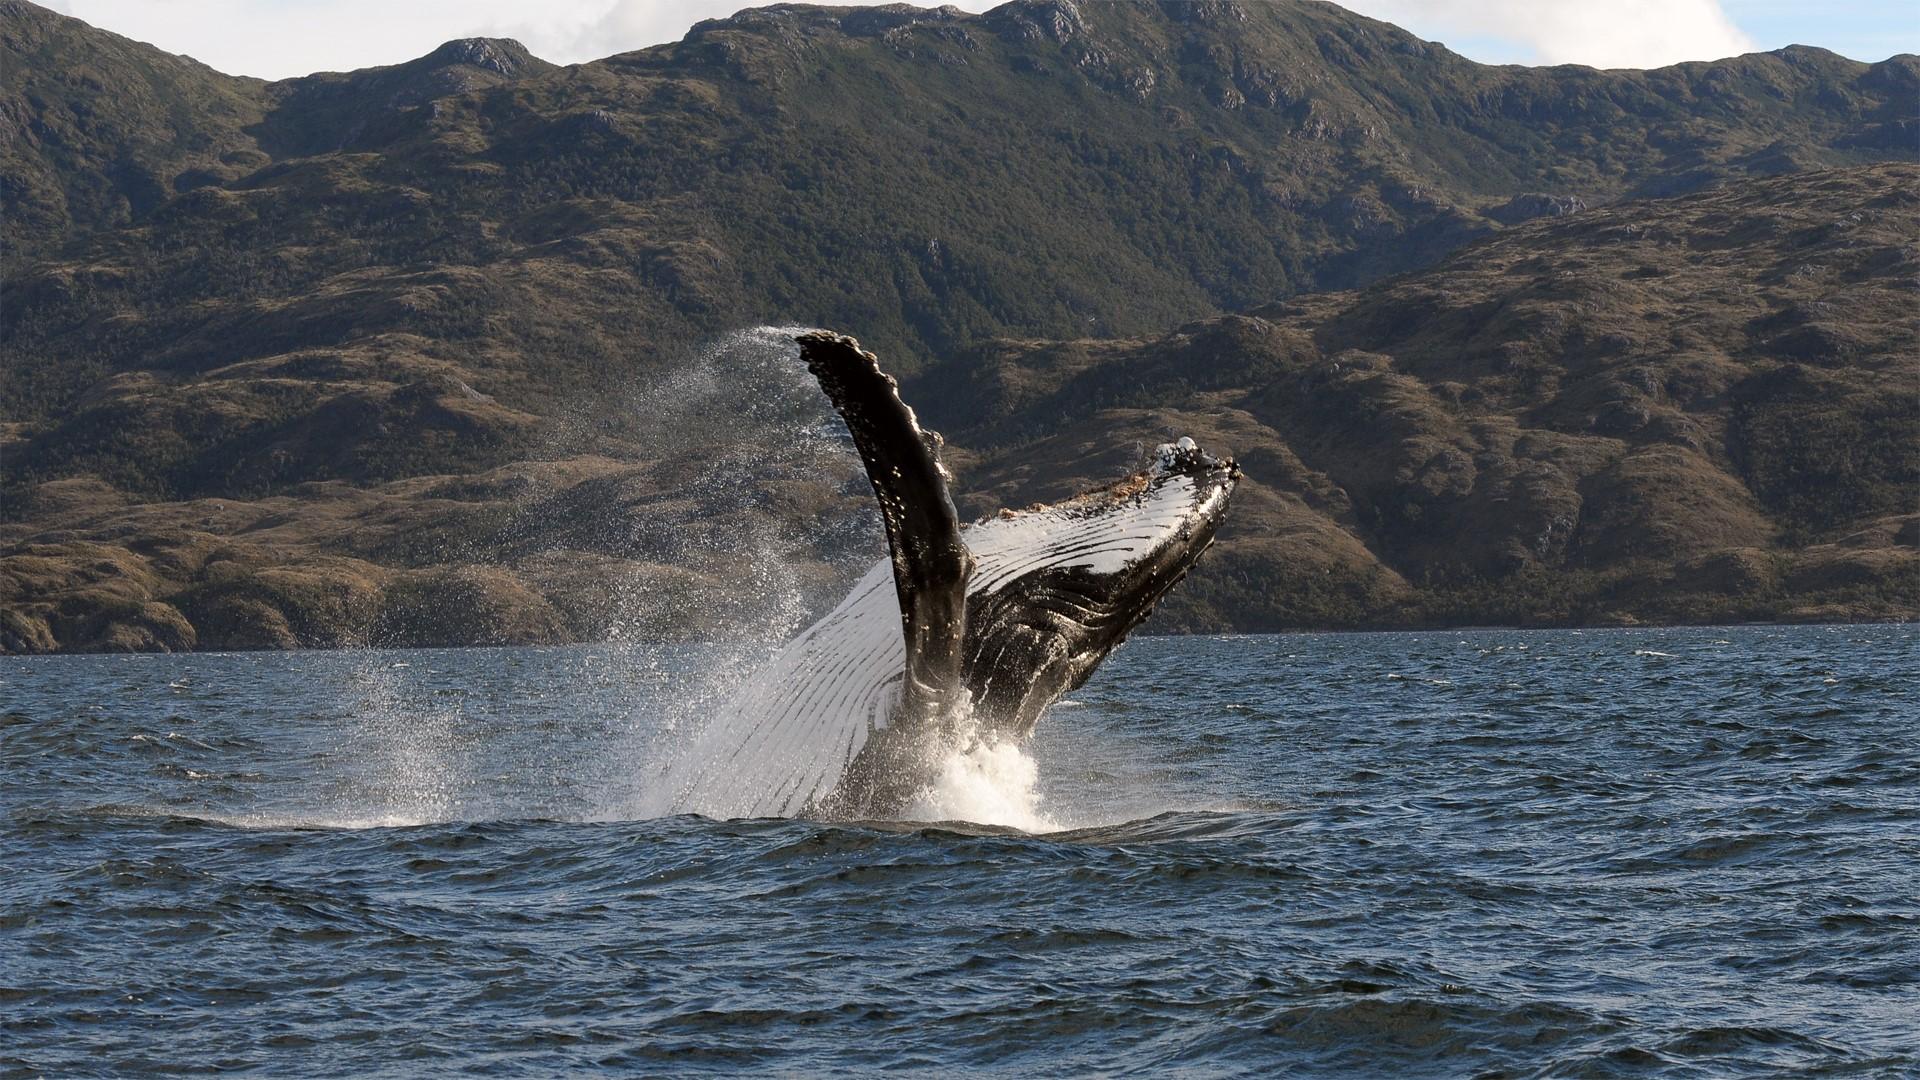 Baleine de l'Ile Carlos III au Chili